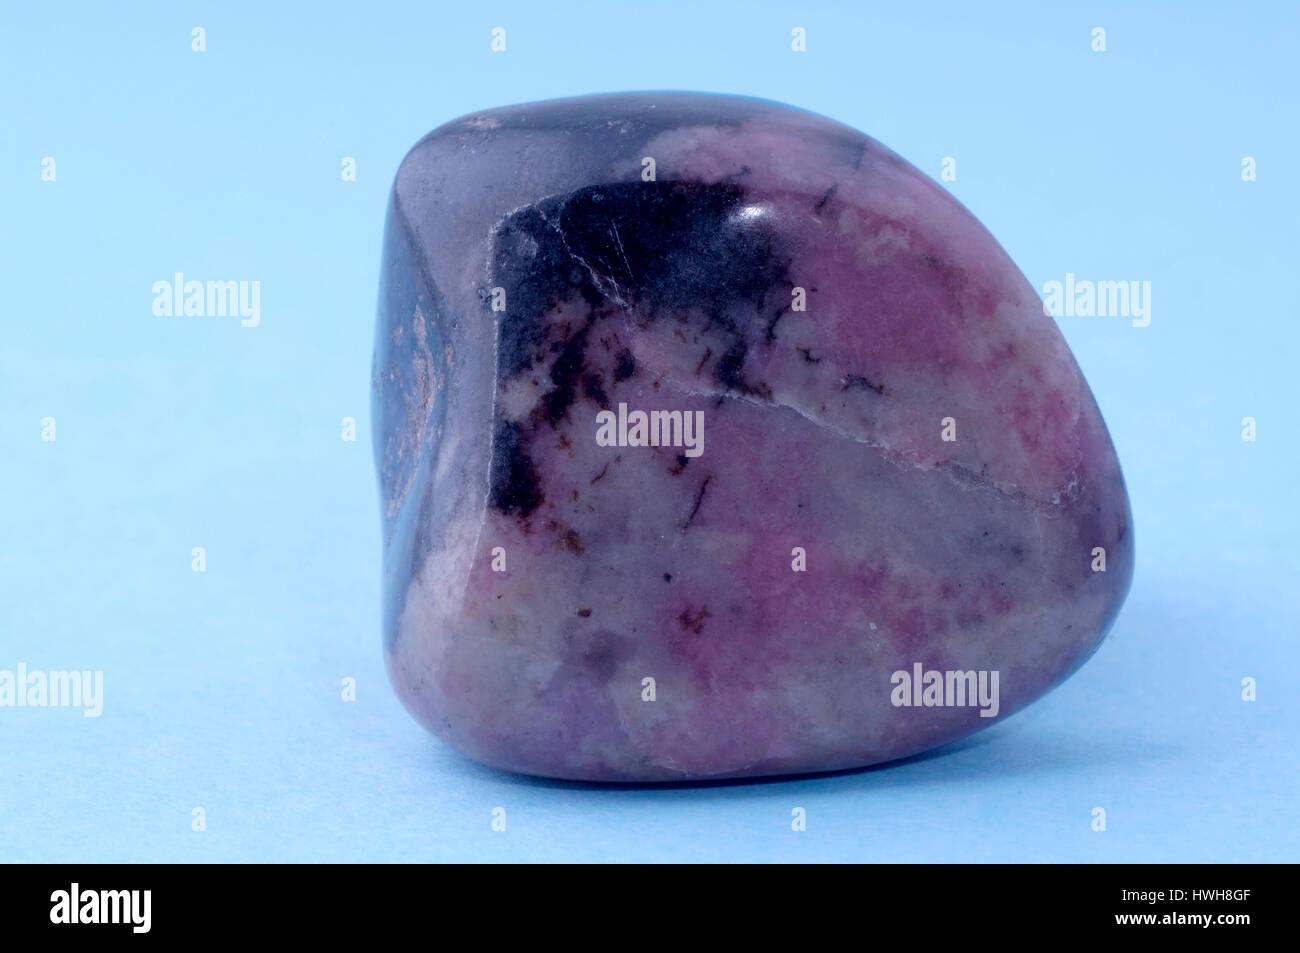 Remedial stones, stones, inside, studio, indoor, free plate, cut out, object, object, Heilsteine, Steine, innen, - Stock Image